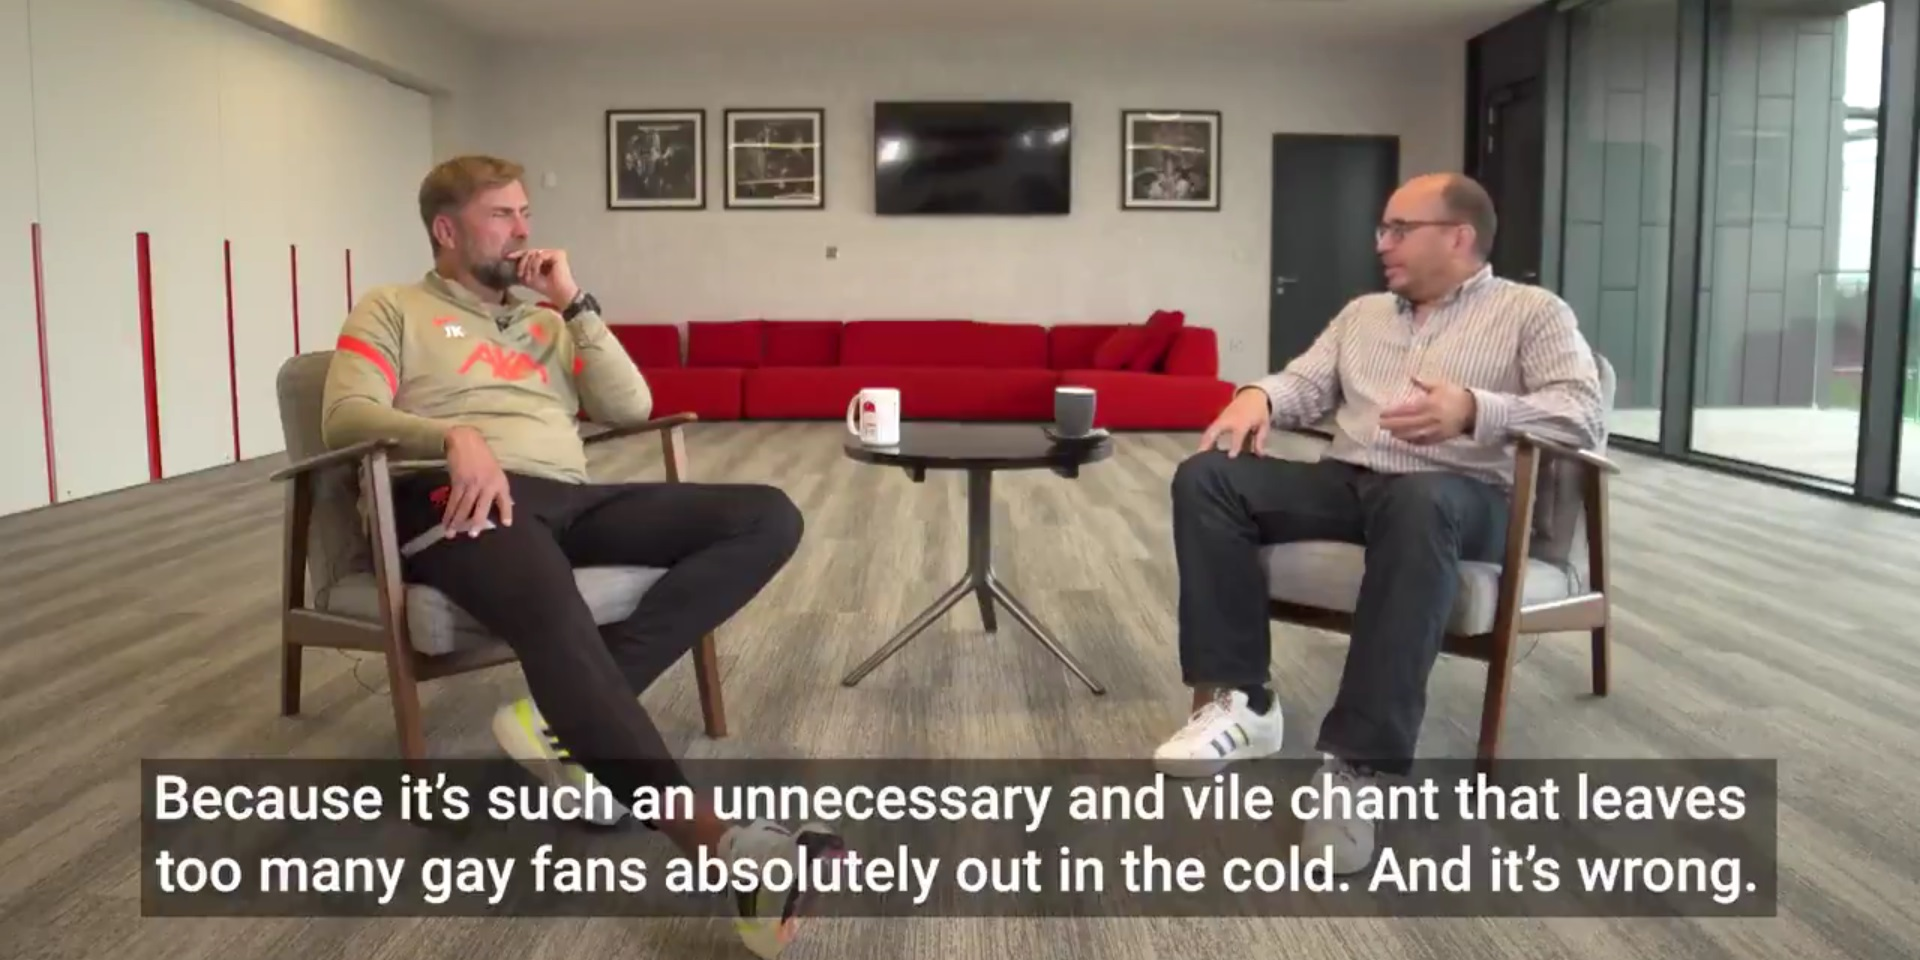 Jurgen Klopp slams homophobic chanting and labels participating Liverpool fans 'idiots'